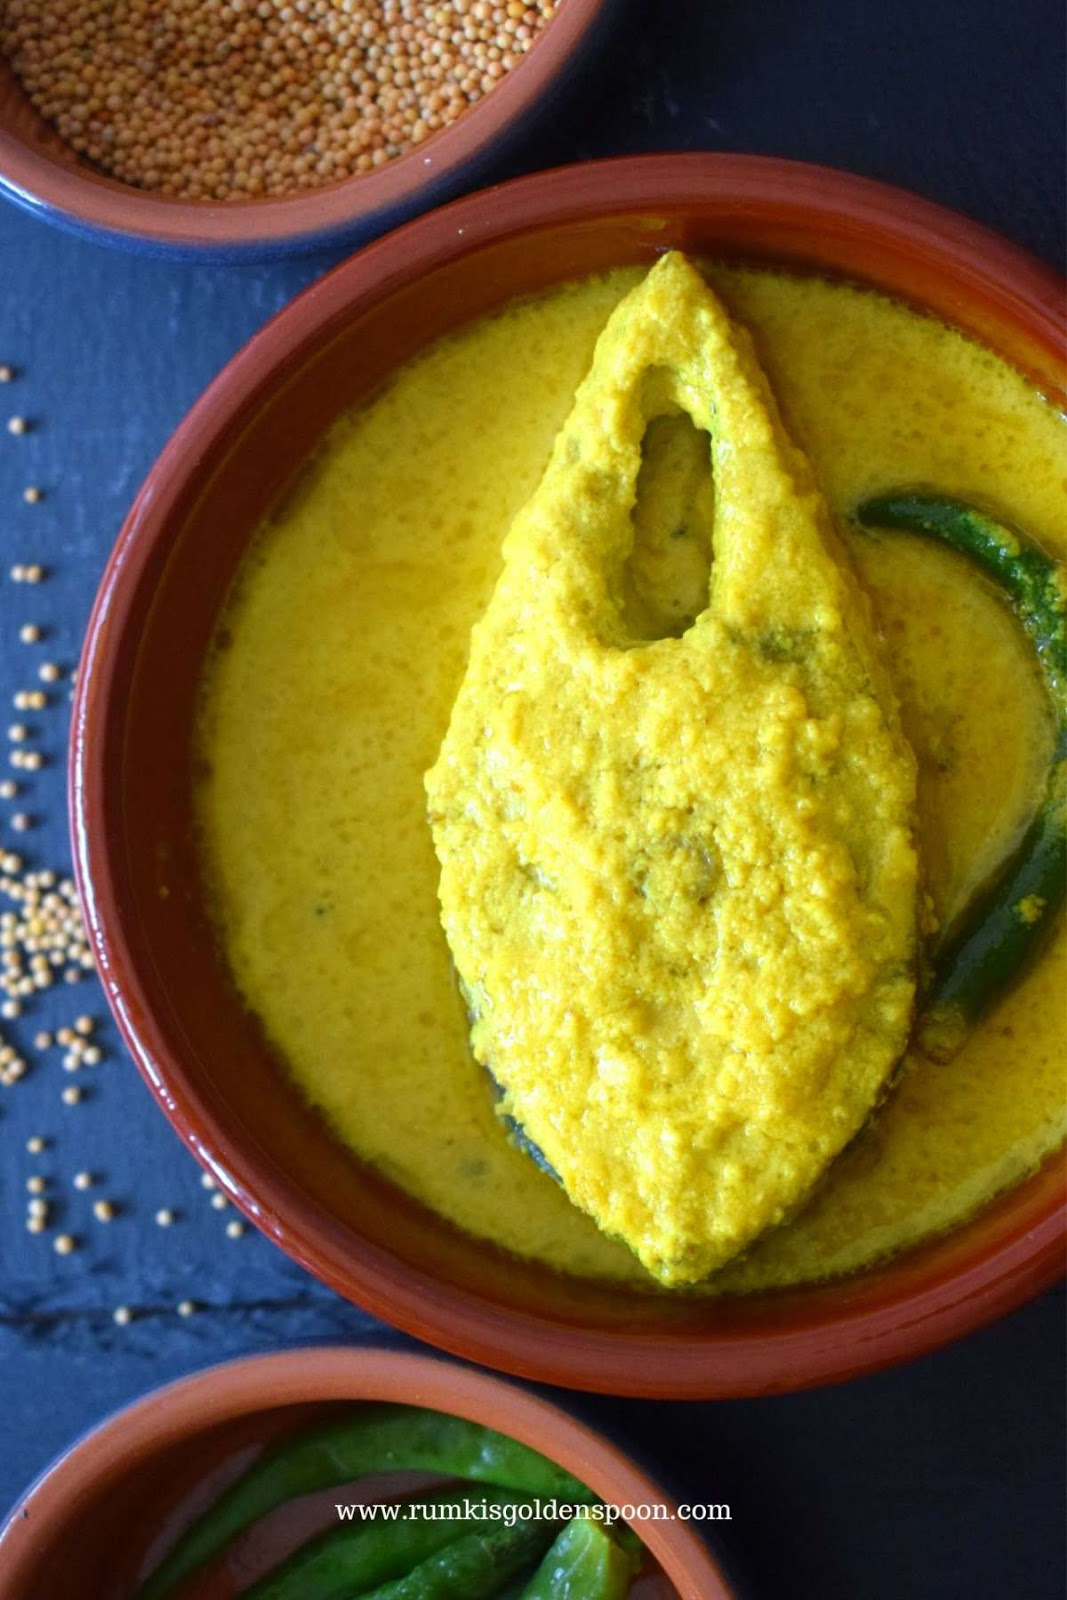 doi ilish, doi ilish recipe, doi ilish step by step, doi ilish bengali recipe, elish mas, recipe for hilsa fish, hilsa recipe, hilsa fish curry, hilsa fish recipe, recipe of hilsa fish, recipe for hilsa fish, how to cook hilsa fish, how to cook Ilish fish, bengali fish recipe, bengali recipe of fish, bengali fish curry recipe, how to make doi ilish, Rumki's Golden Spoon